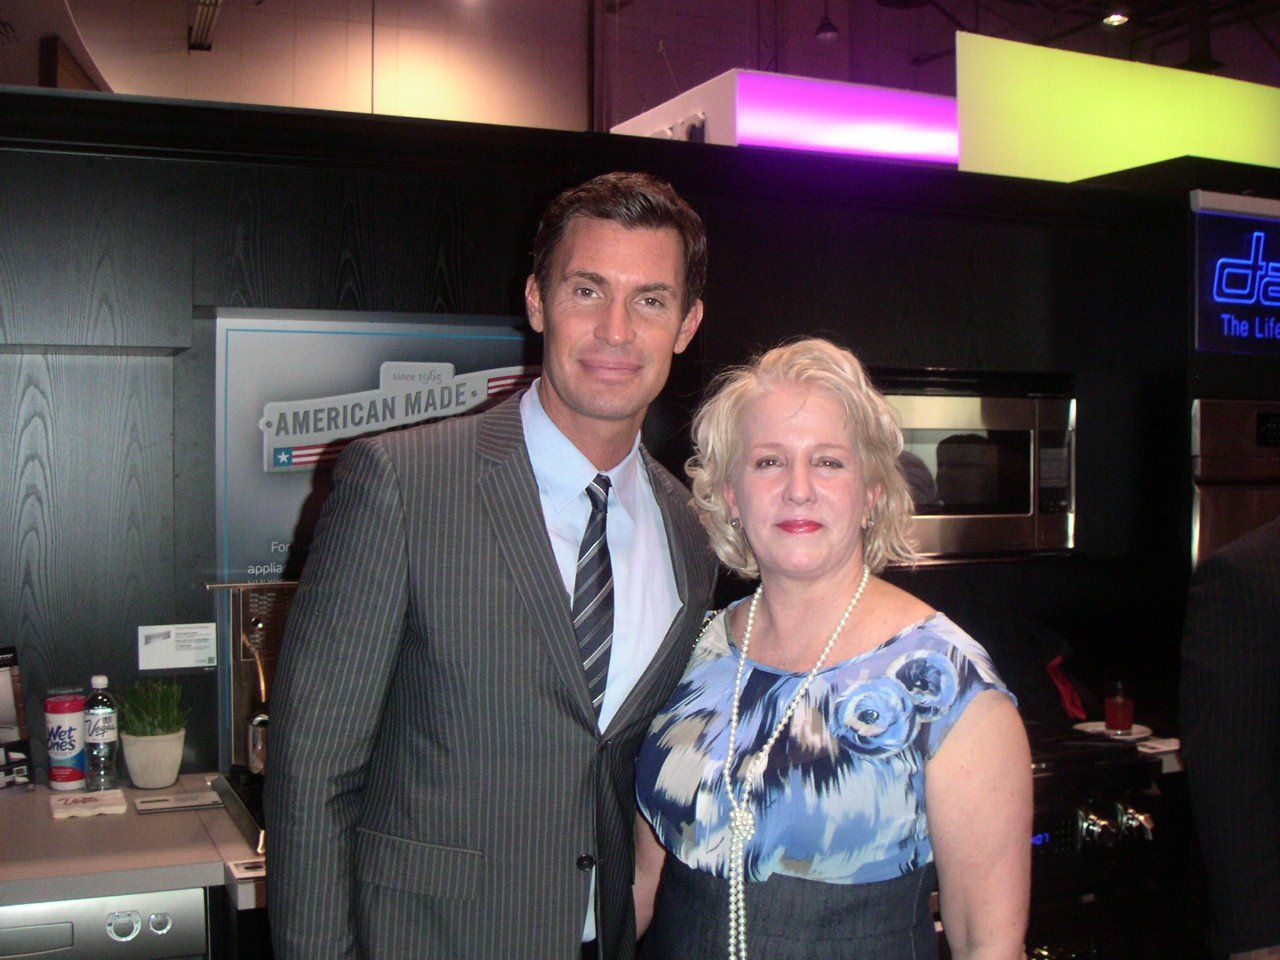 Barbara Segal Of Noir Blanc Interiors With Jeff Lewis Of Jeff